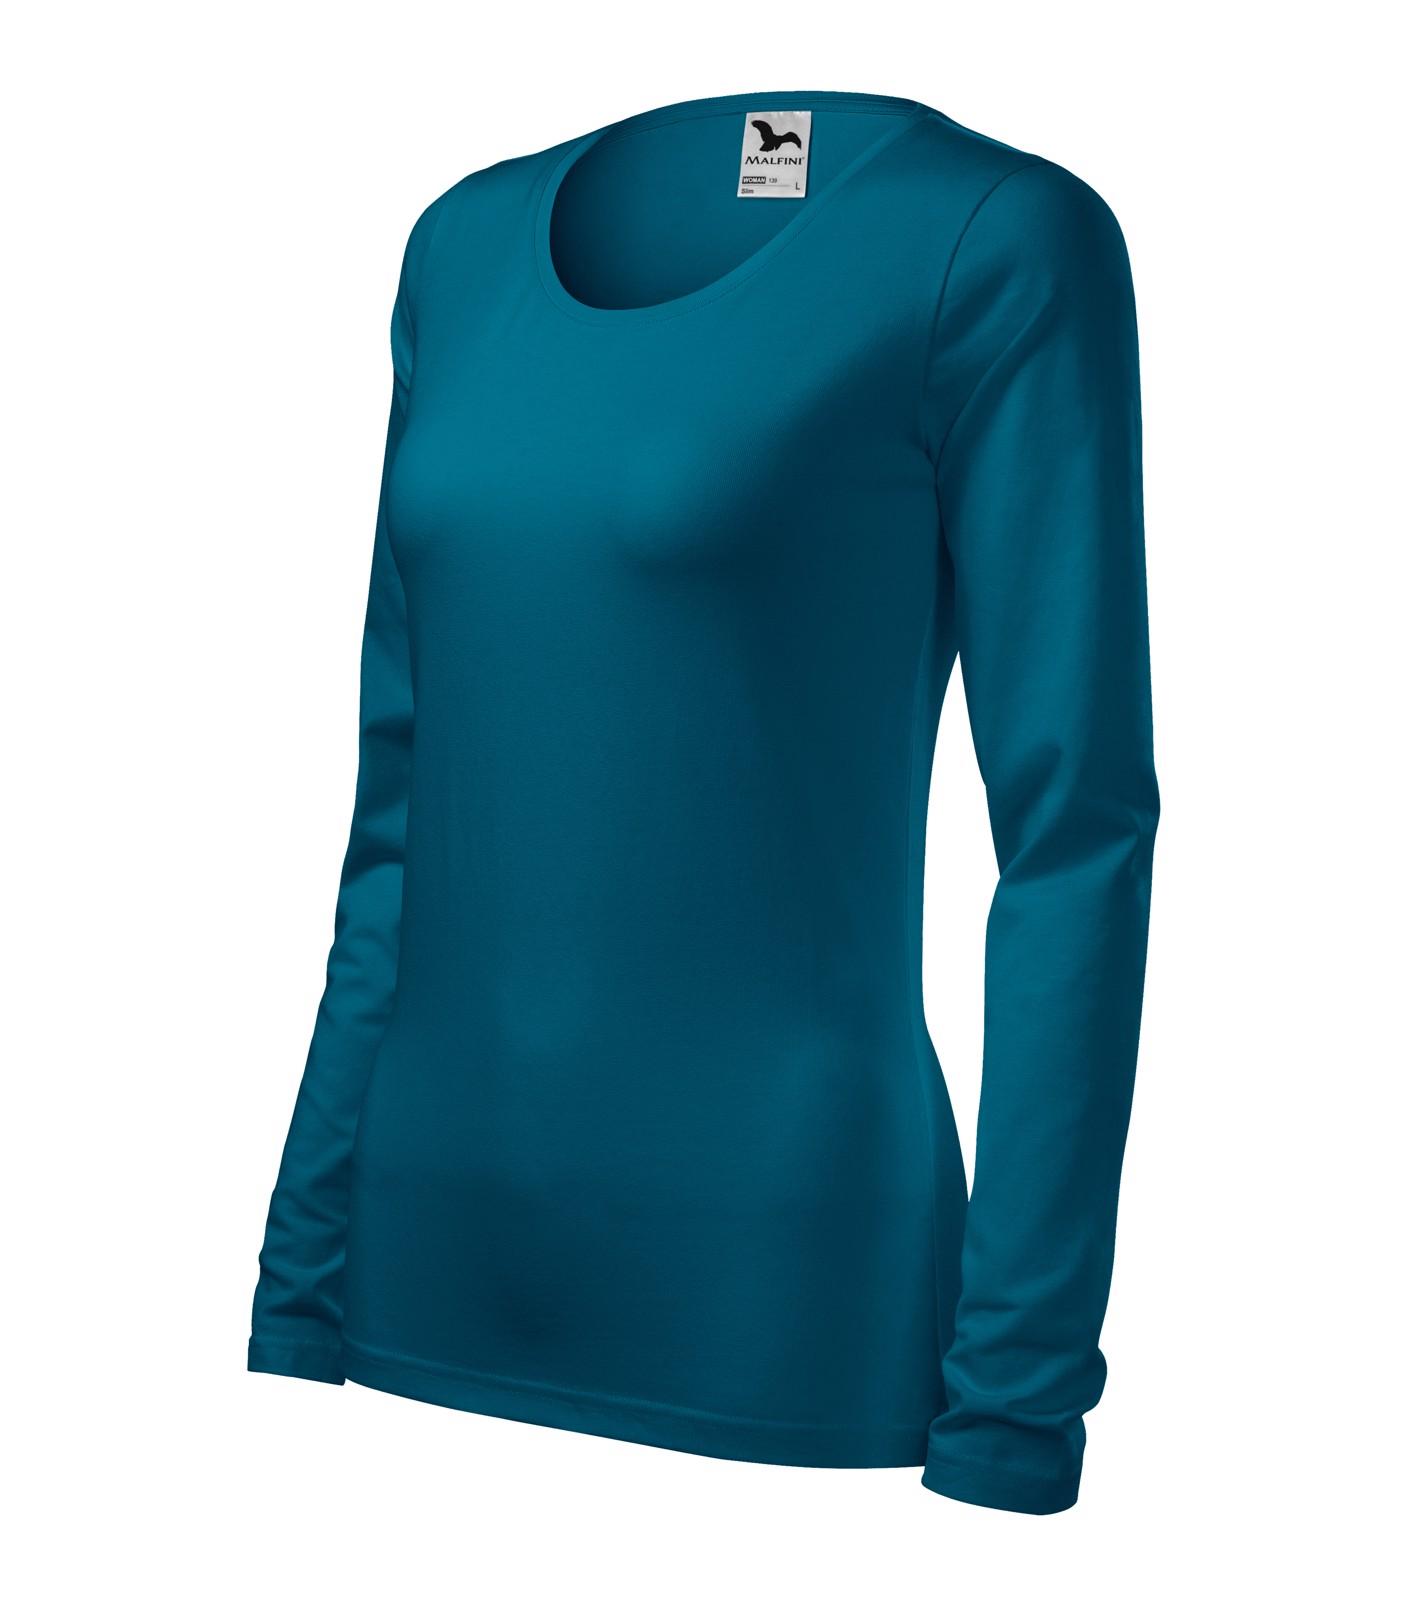 T-shirt women's Malfini Slim - Petrol Blue / 2XL